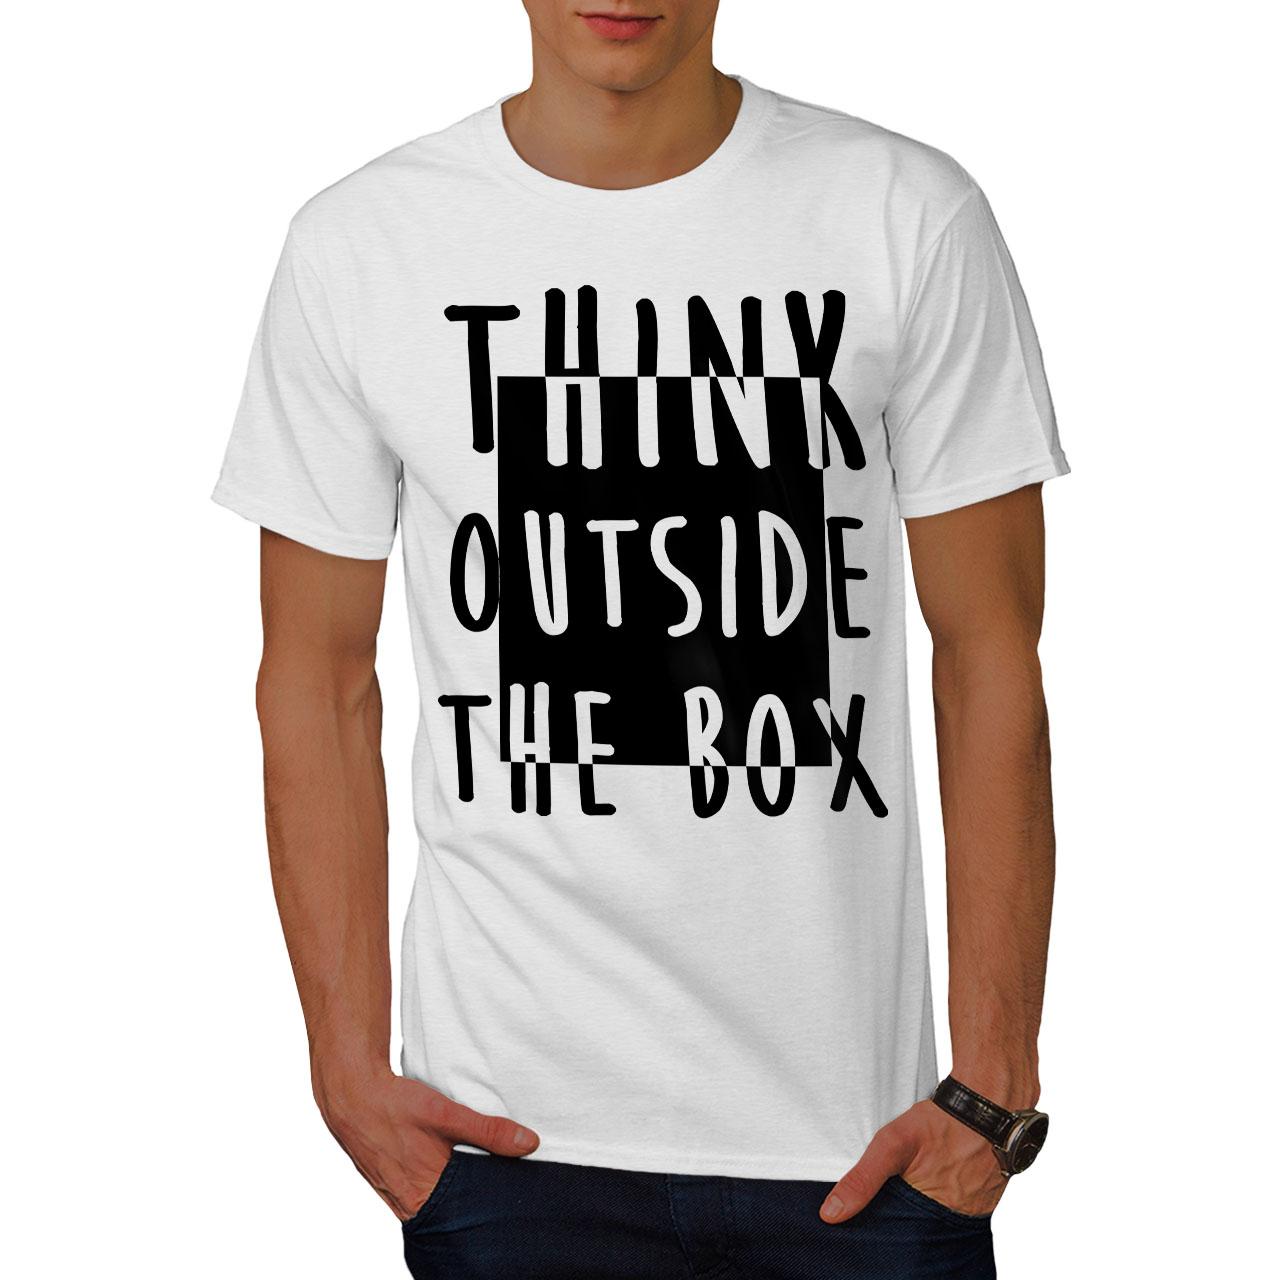 Wellcoda Think Outside Mens T-shirt Wisdom Box Graphic Design Printed Tee